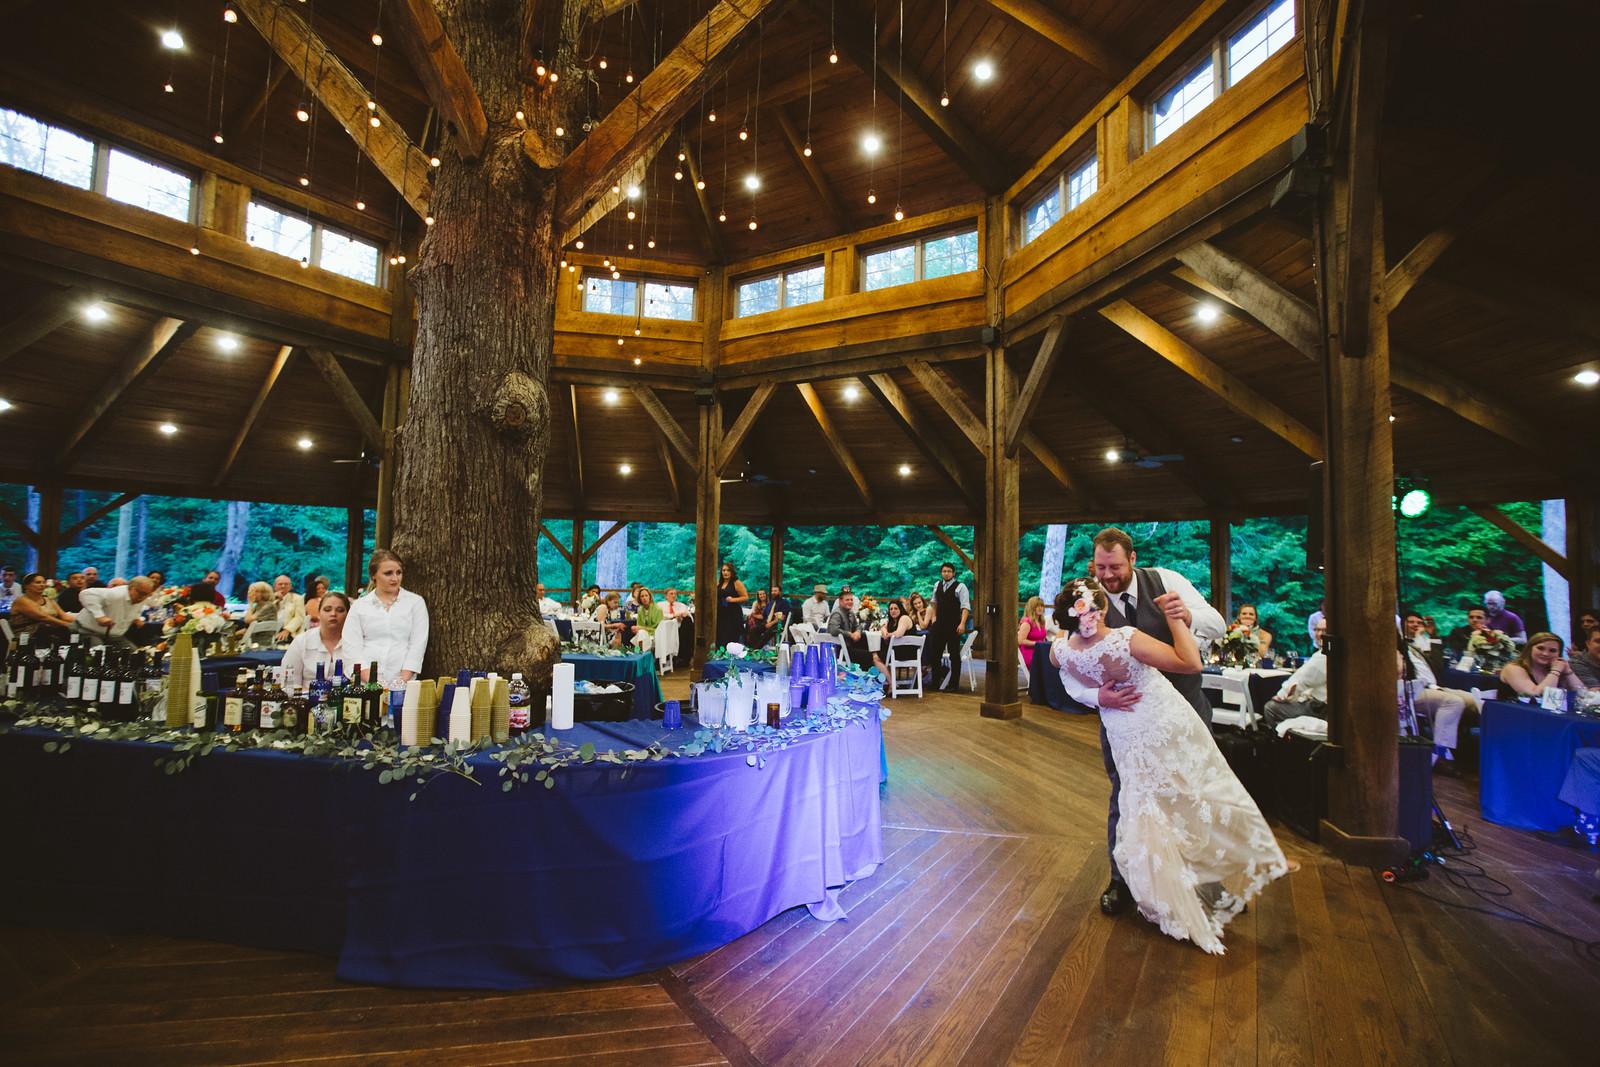 hotmetalstudio pittsburgh wedding photographer-752-X3.jpg